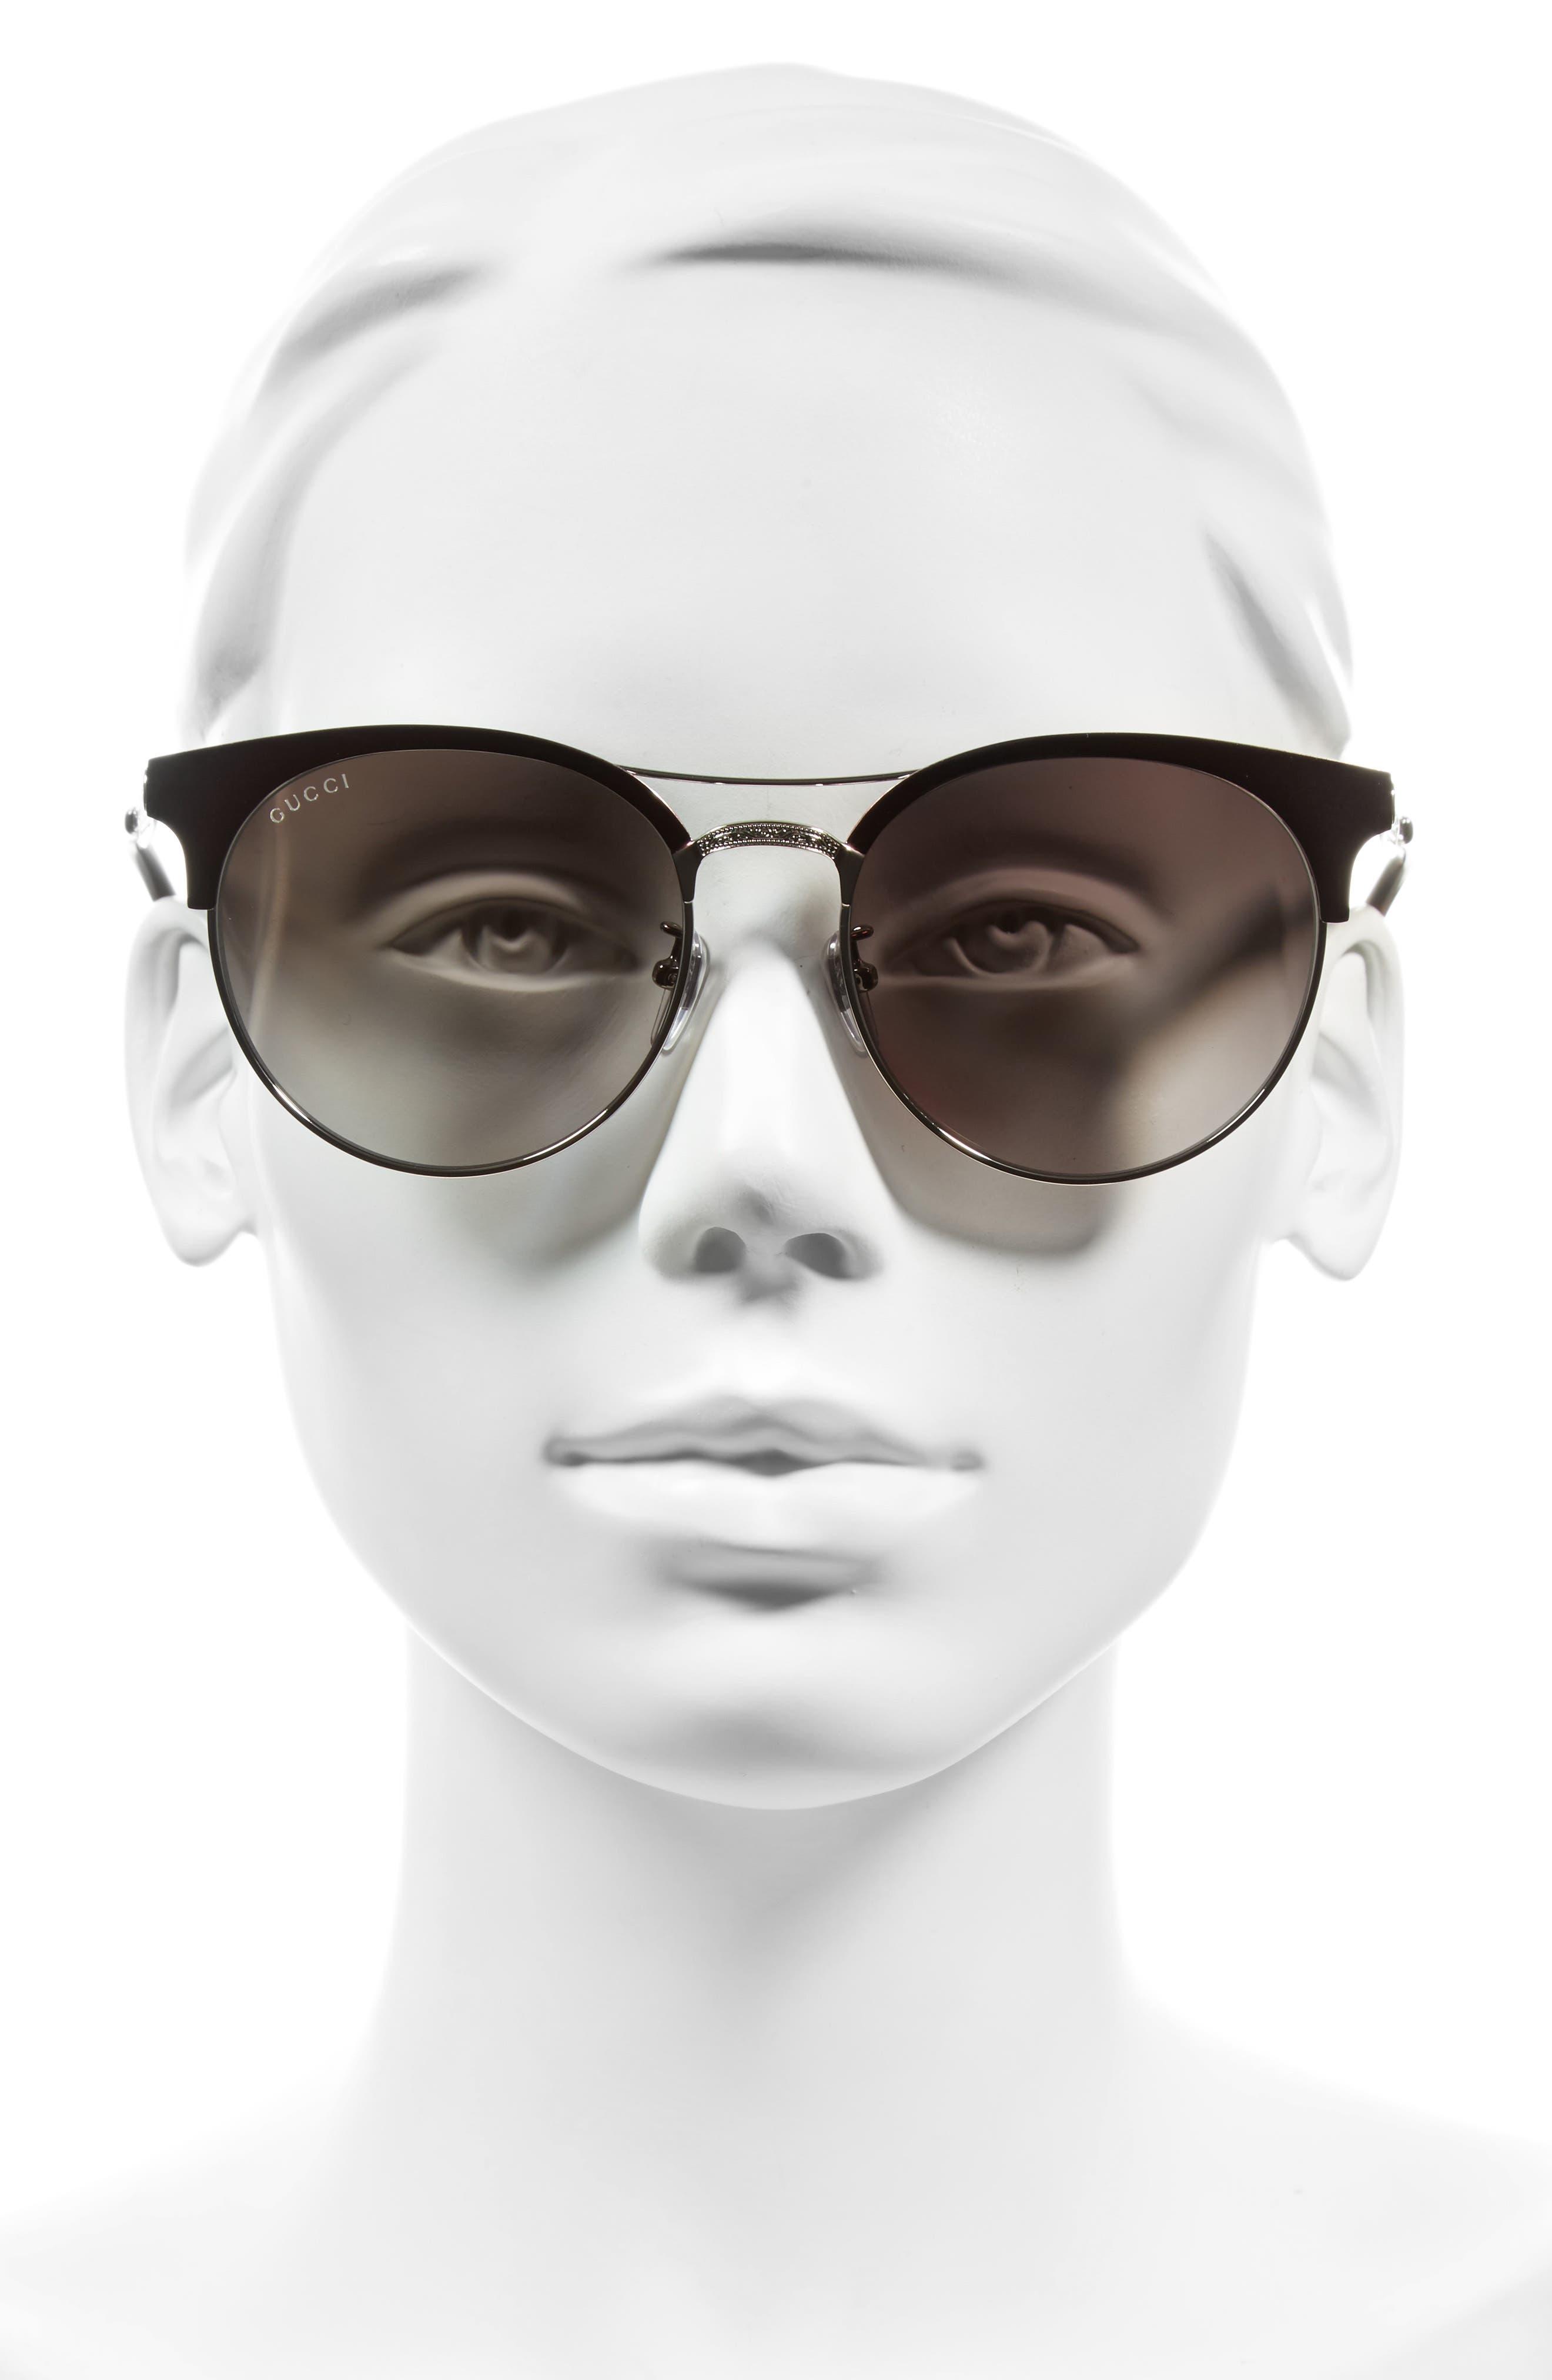 56mm Retro Sunglasses,                             Alternate thumbnail 6, color,